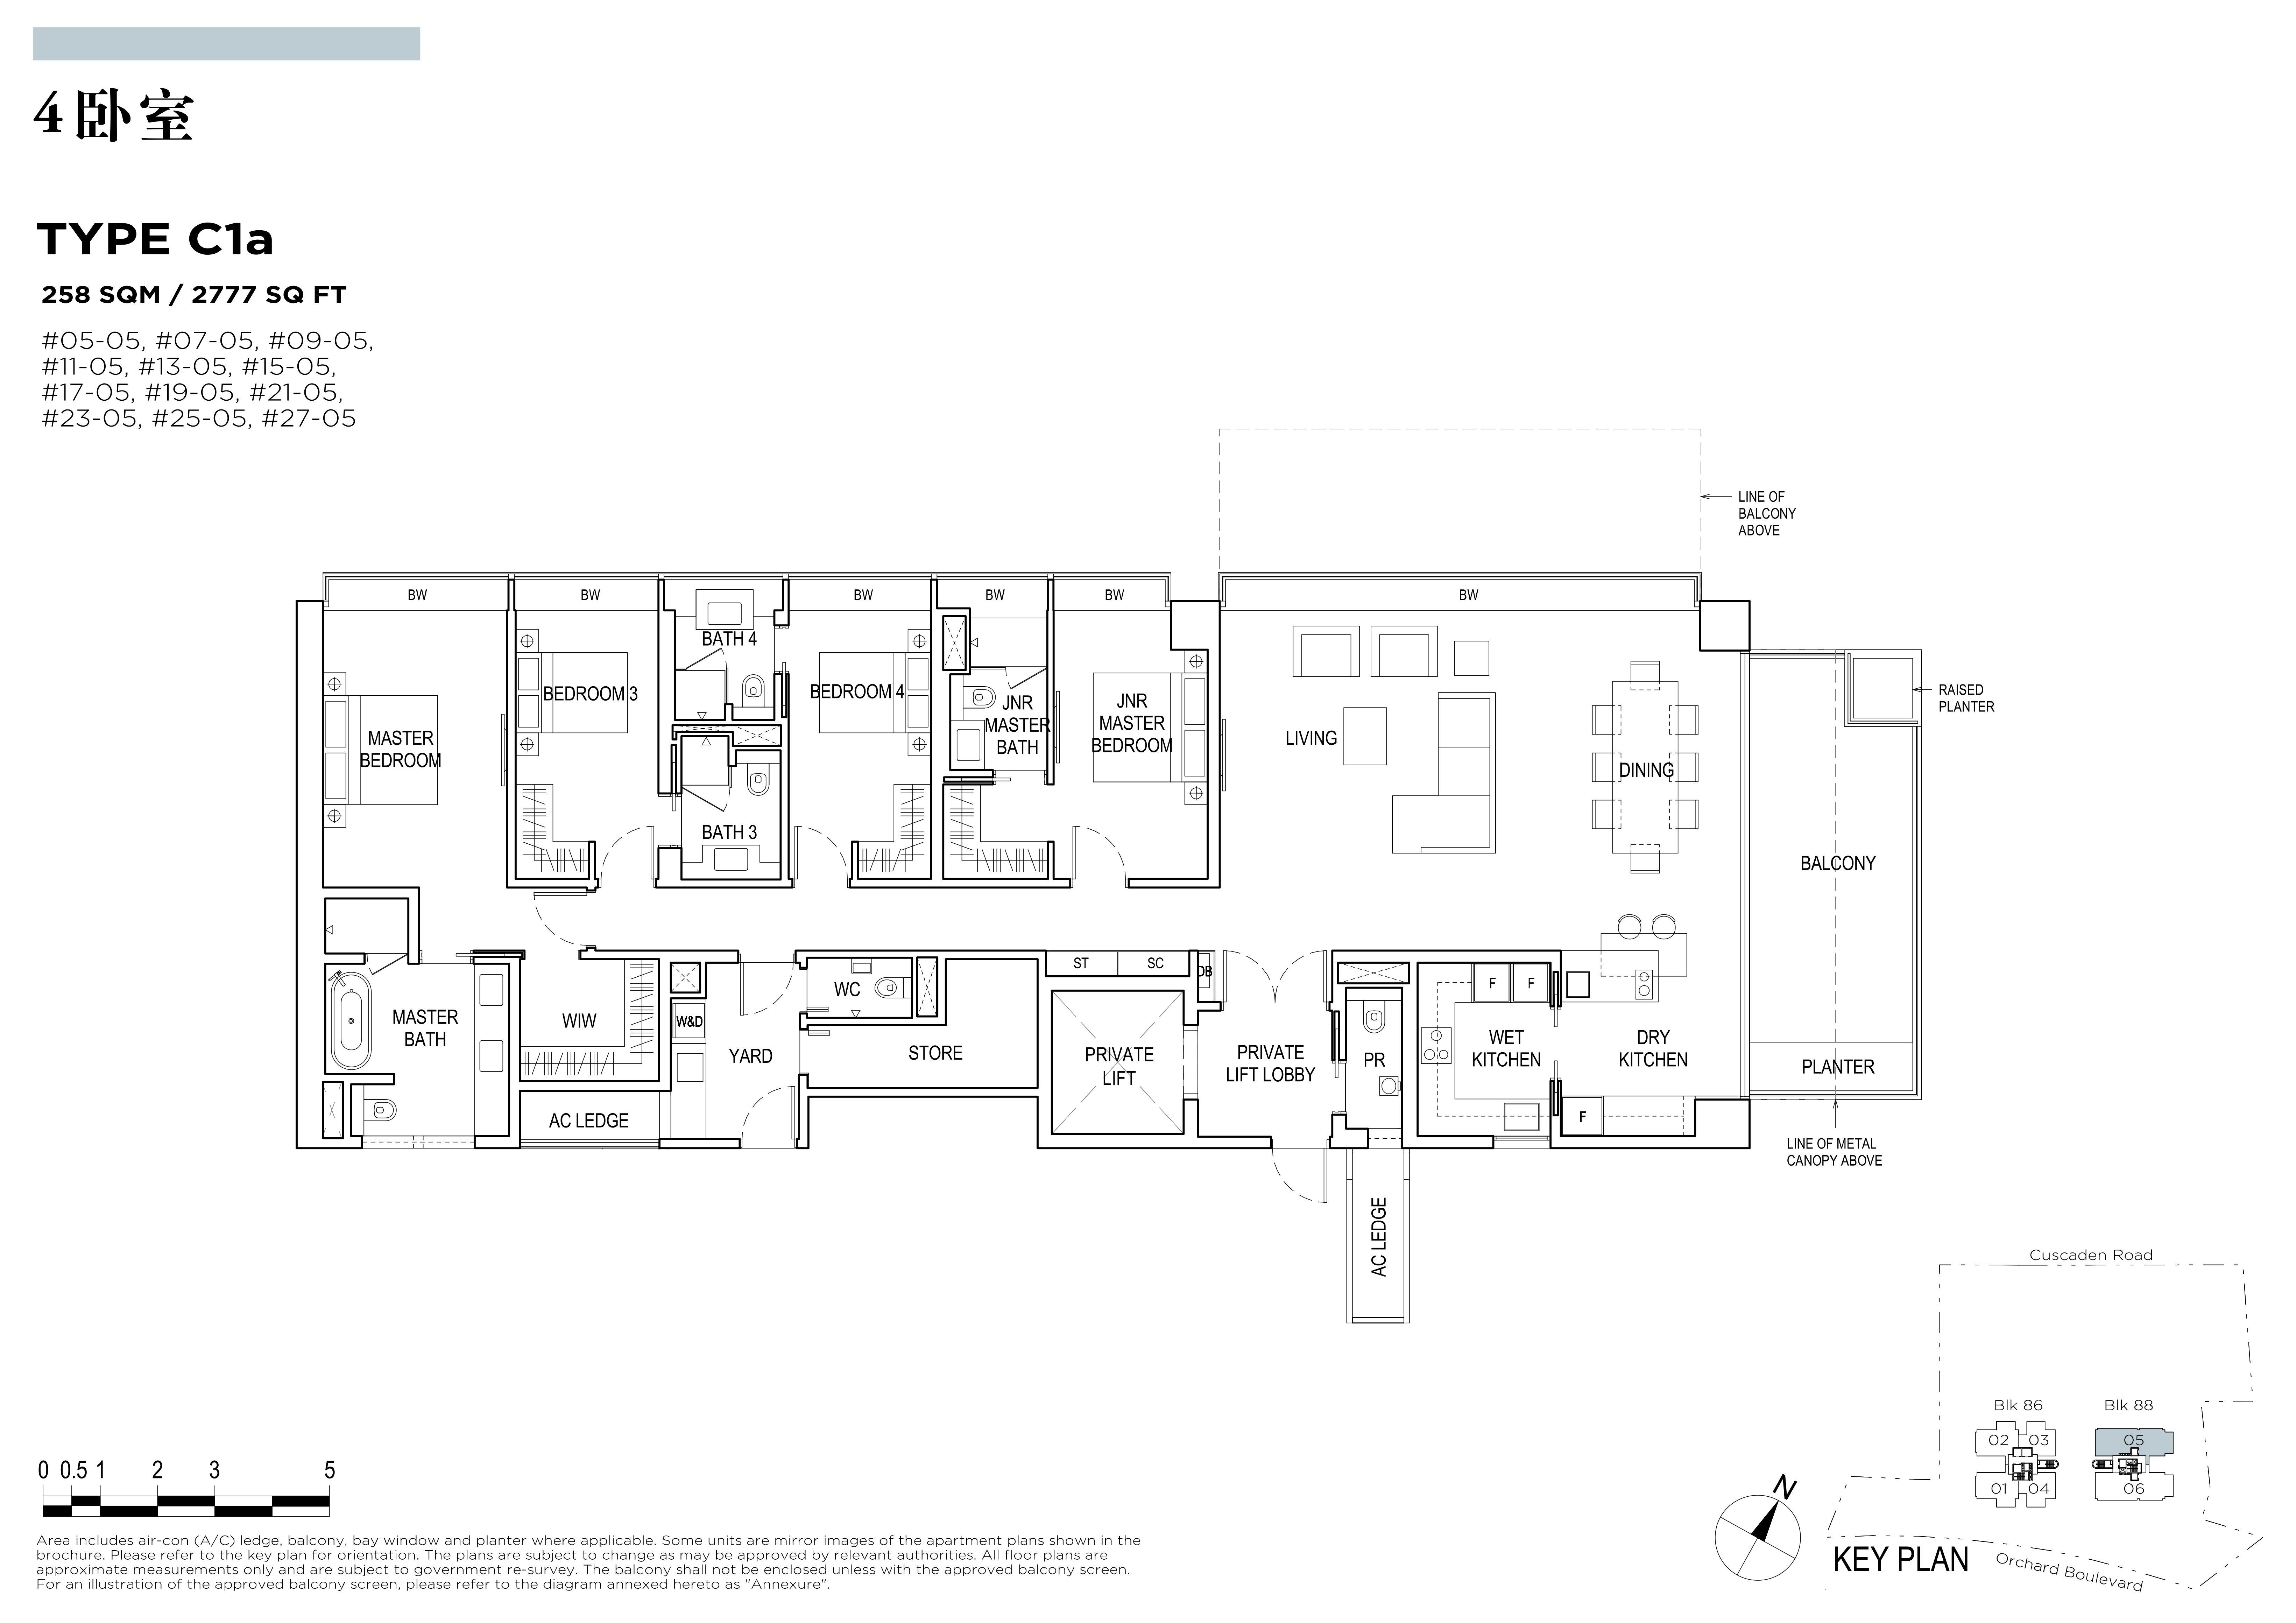 铂瑞雅居 Boulevard 88 floor plan 4 卧房 c1a